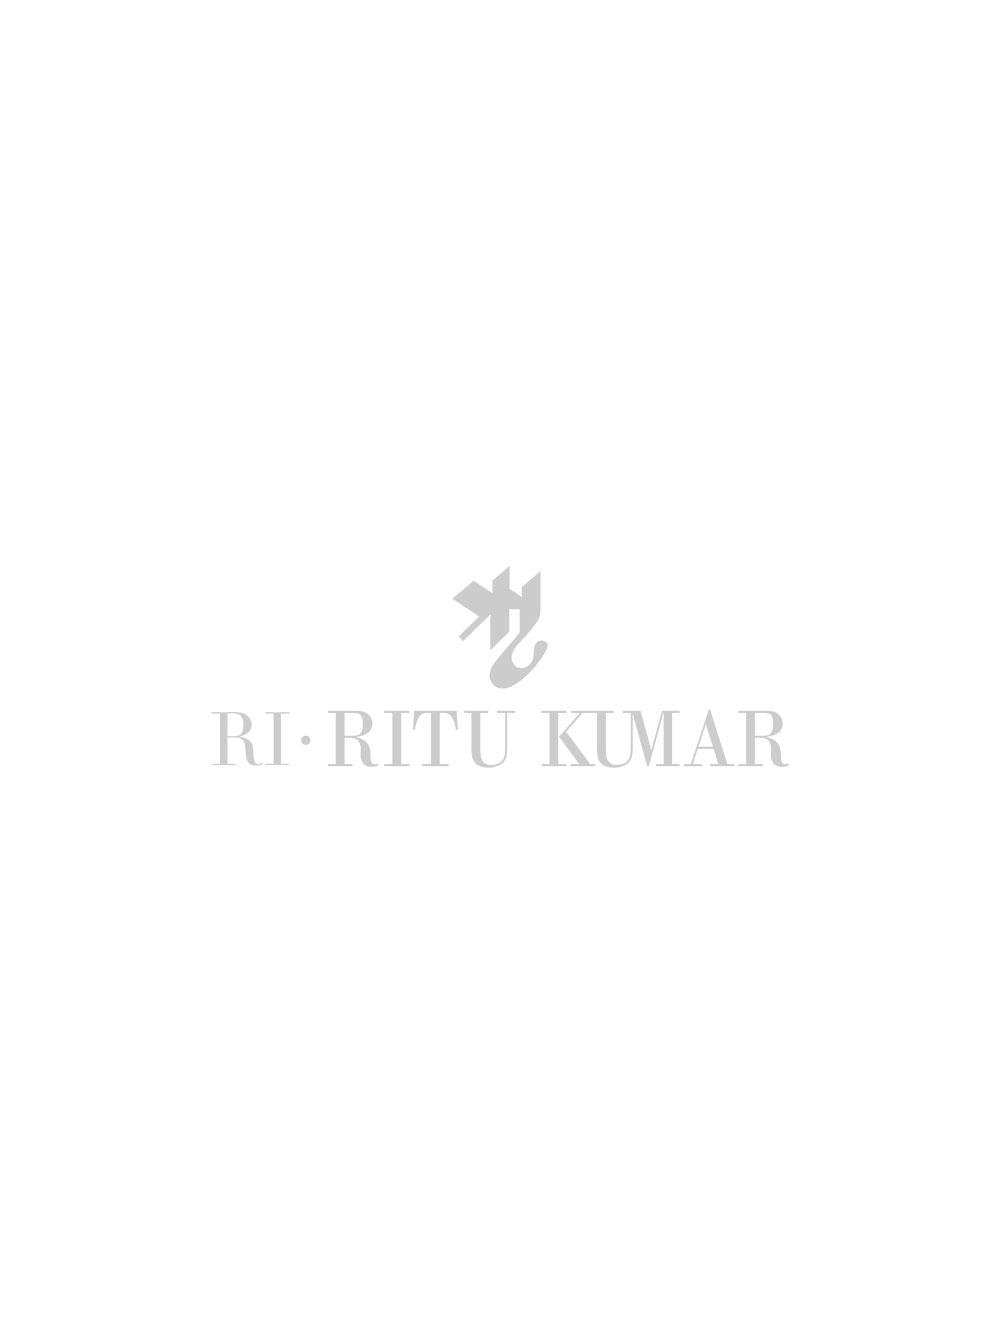 Burgundy & Black Embroidered Kurta With Dhoti Pants